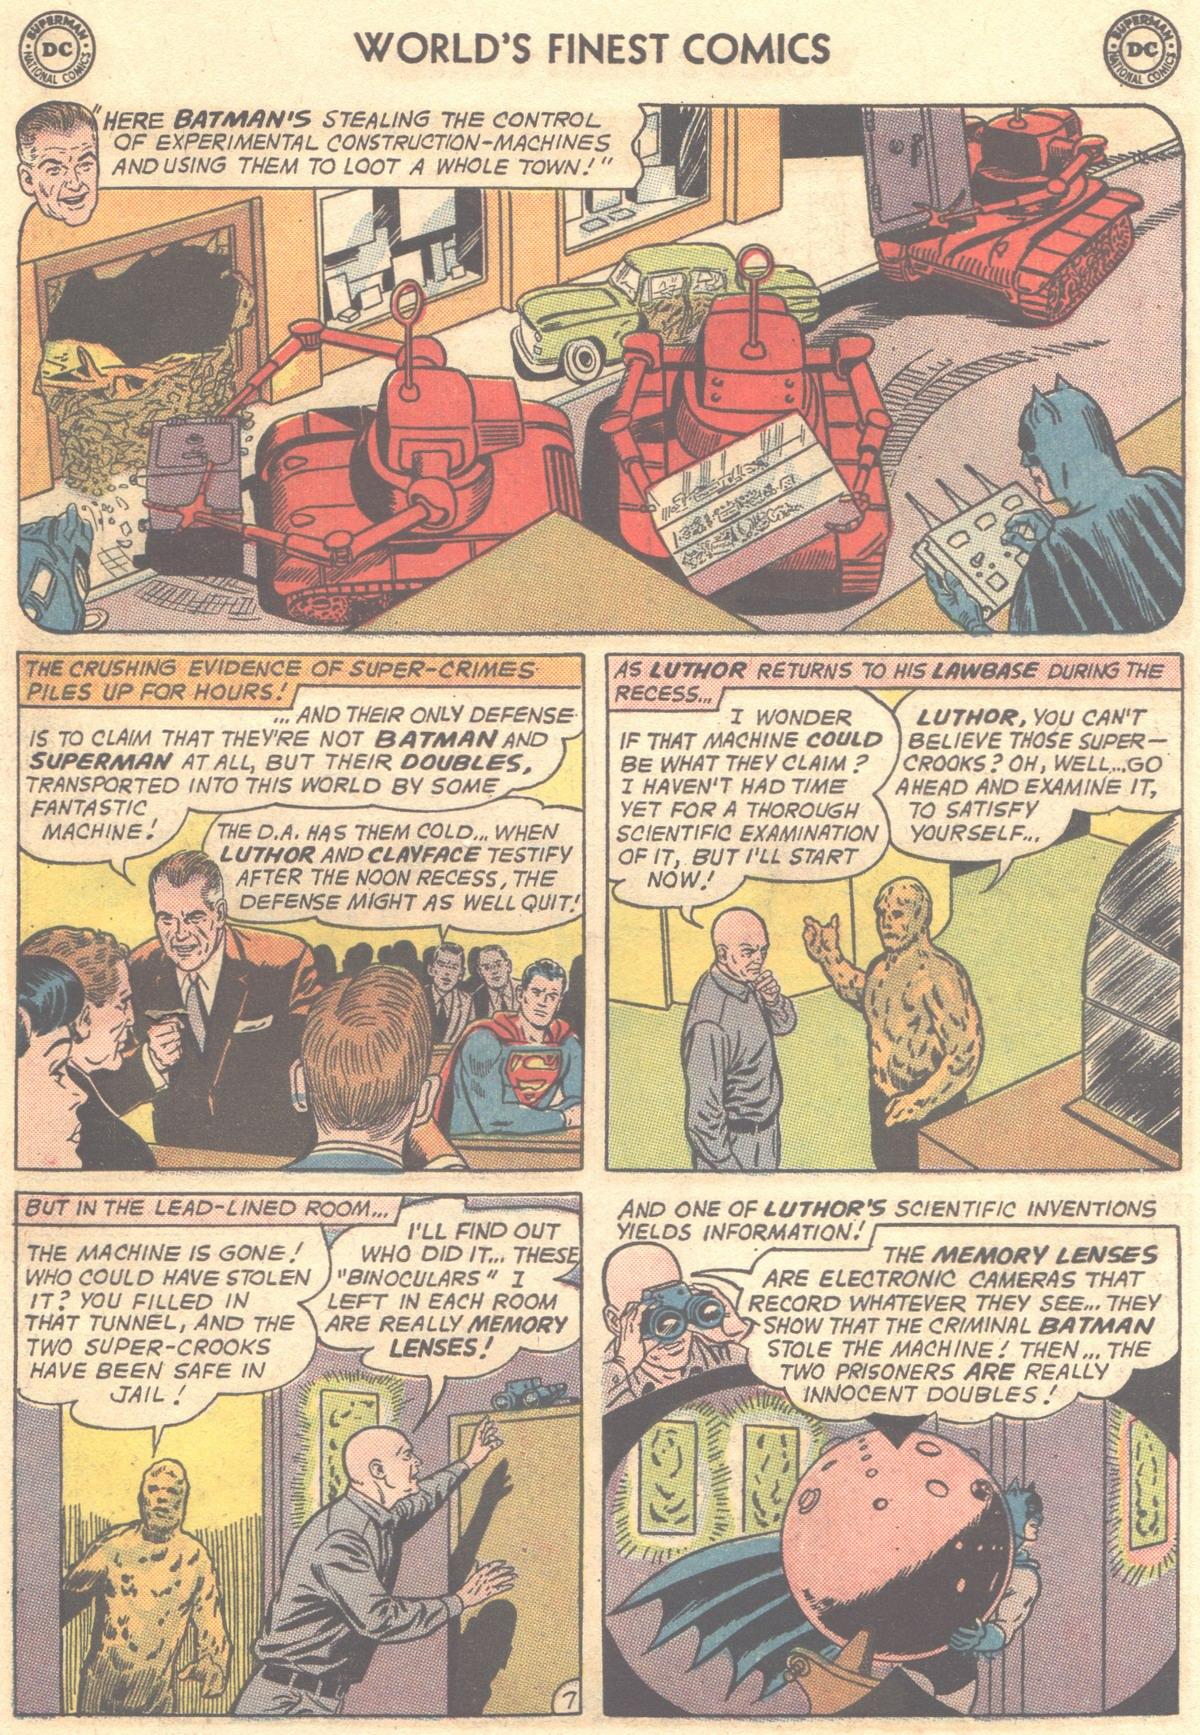 Read online World's Finest Comics comic -  Issue #148 - 19